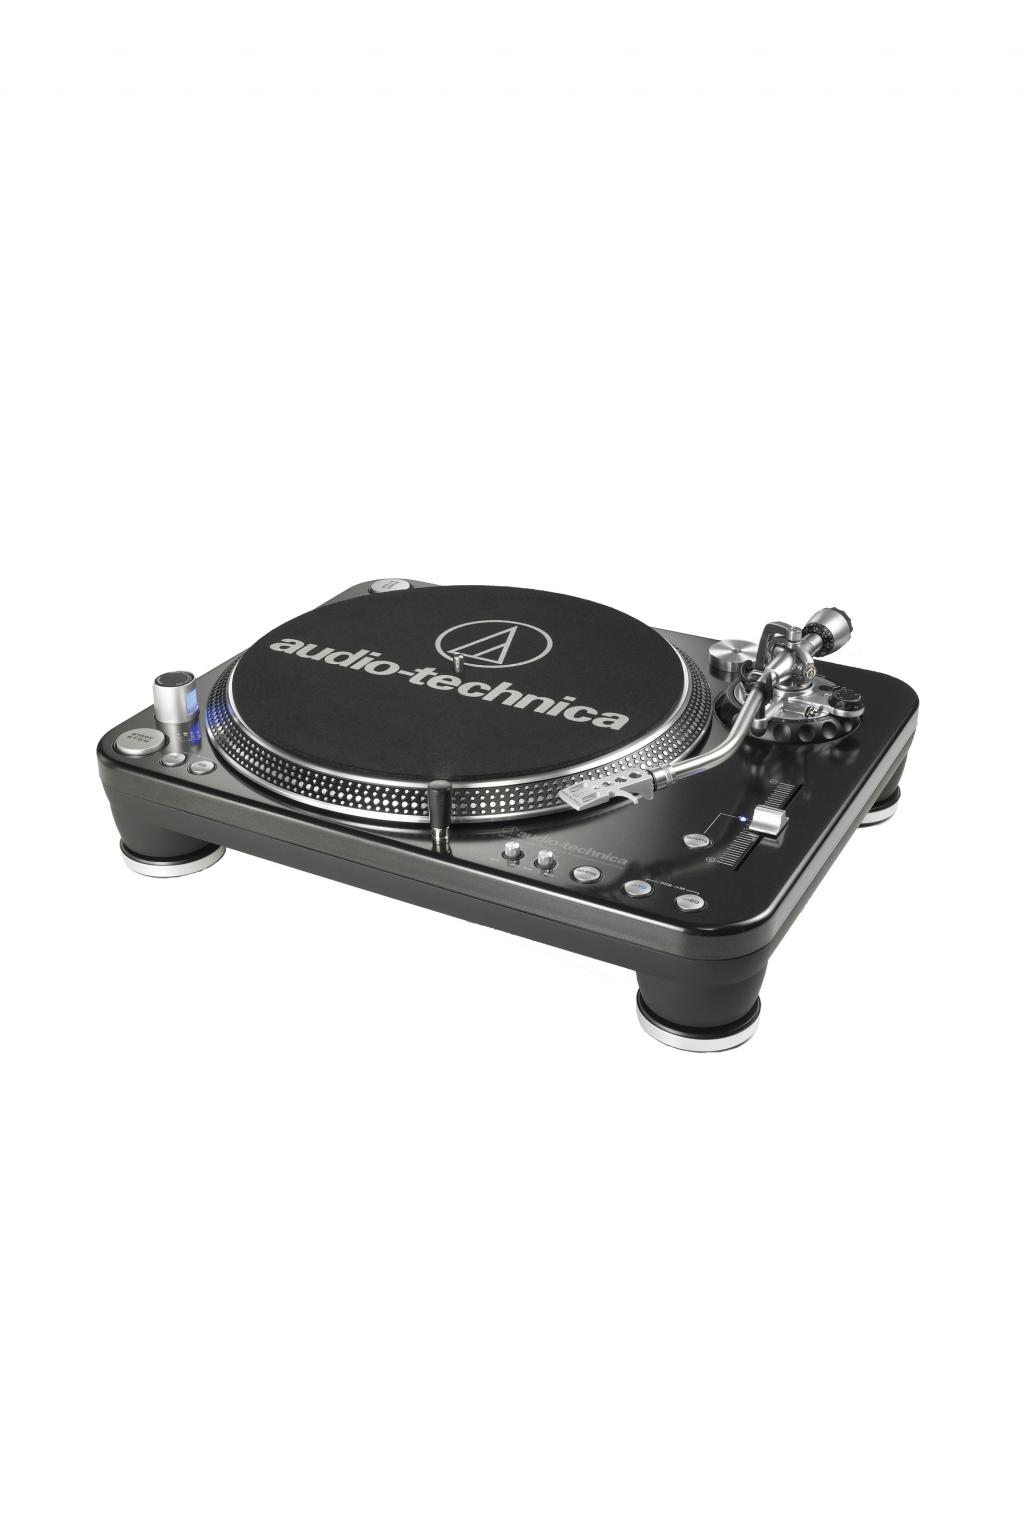 Pick-up Audio-technica At-lp1240usb